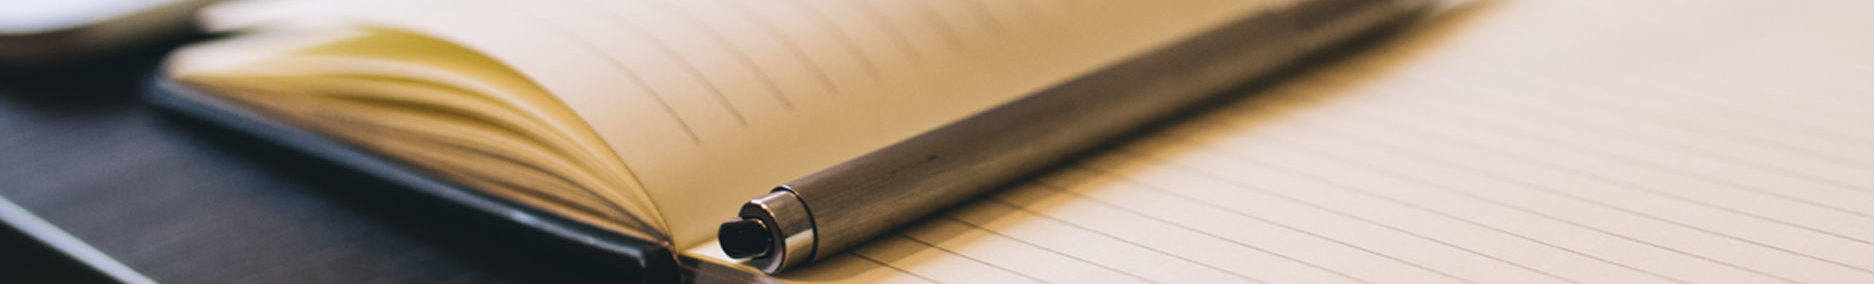 Image of a Pen/Book